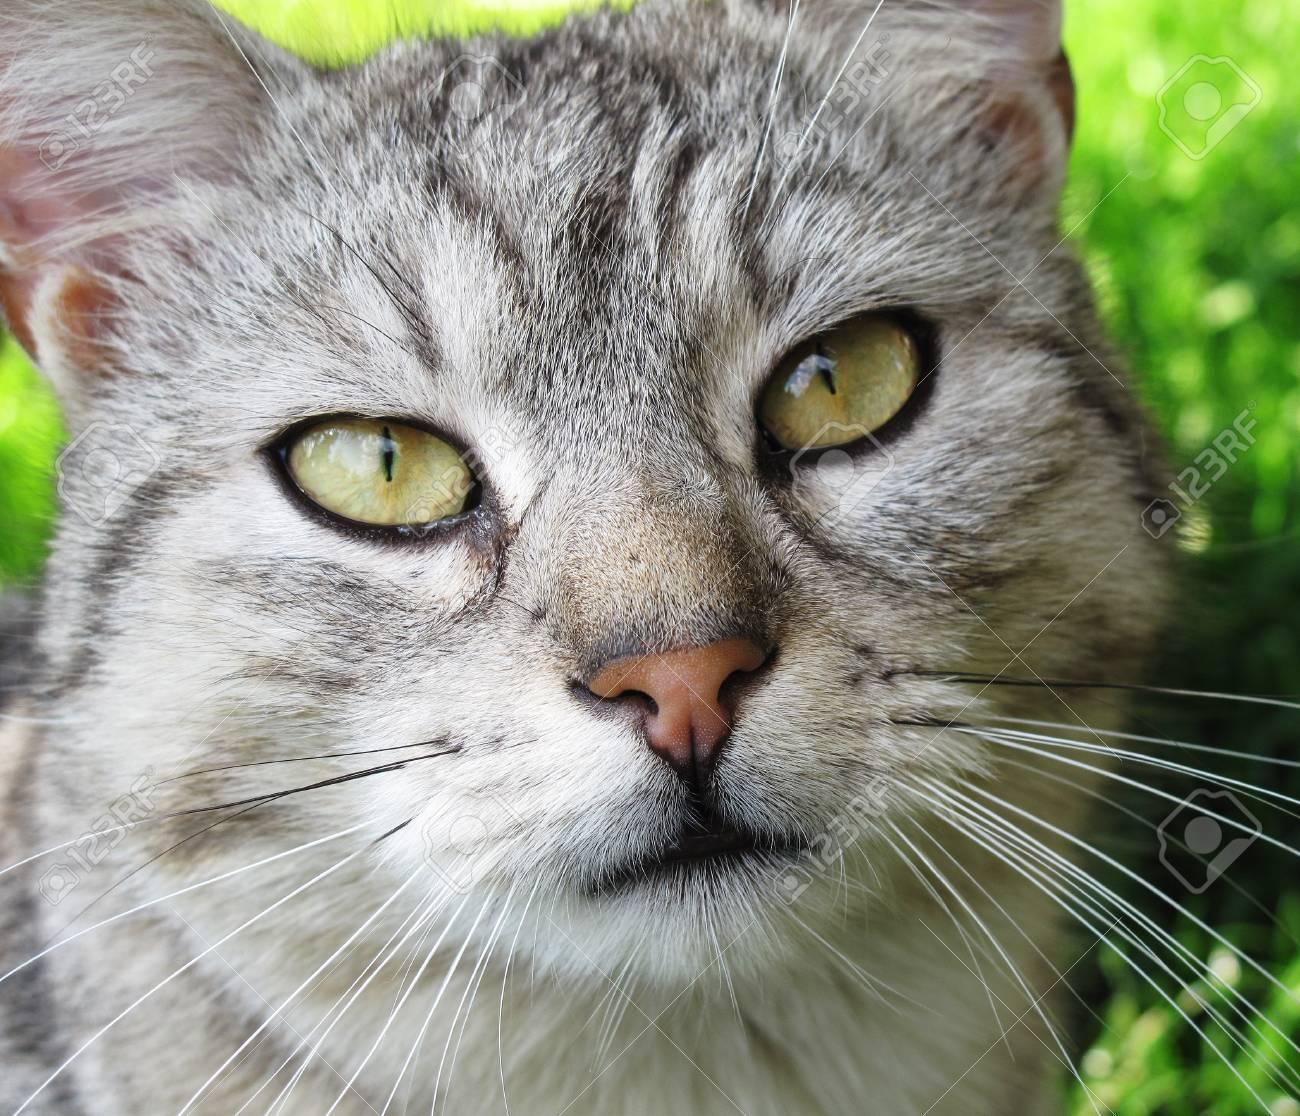 Domestic cat closeup portrait Stock Photo - 55118298